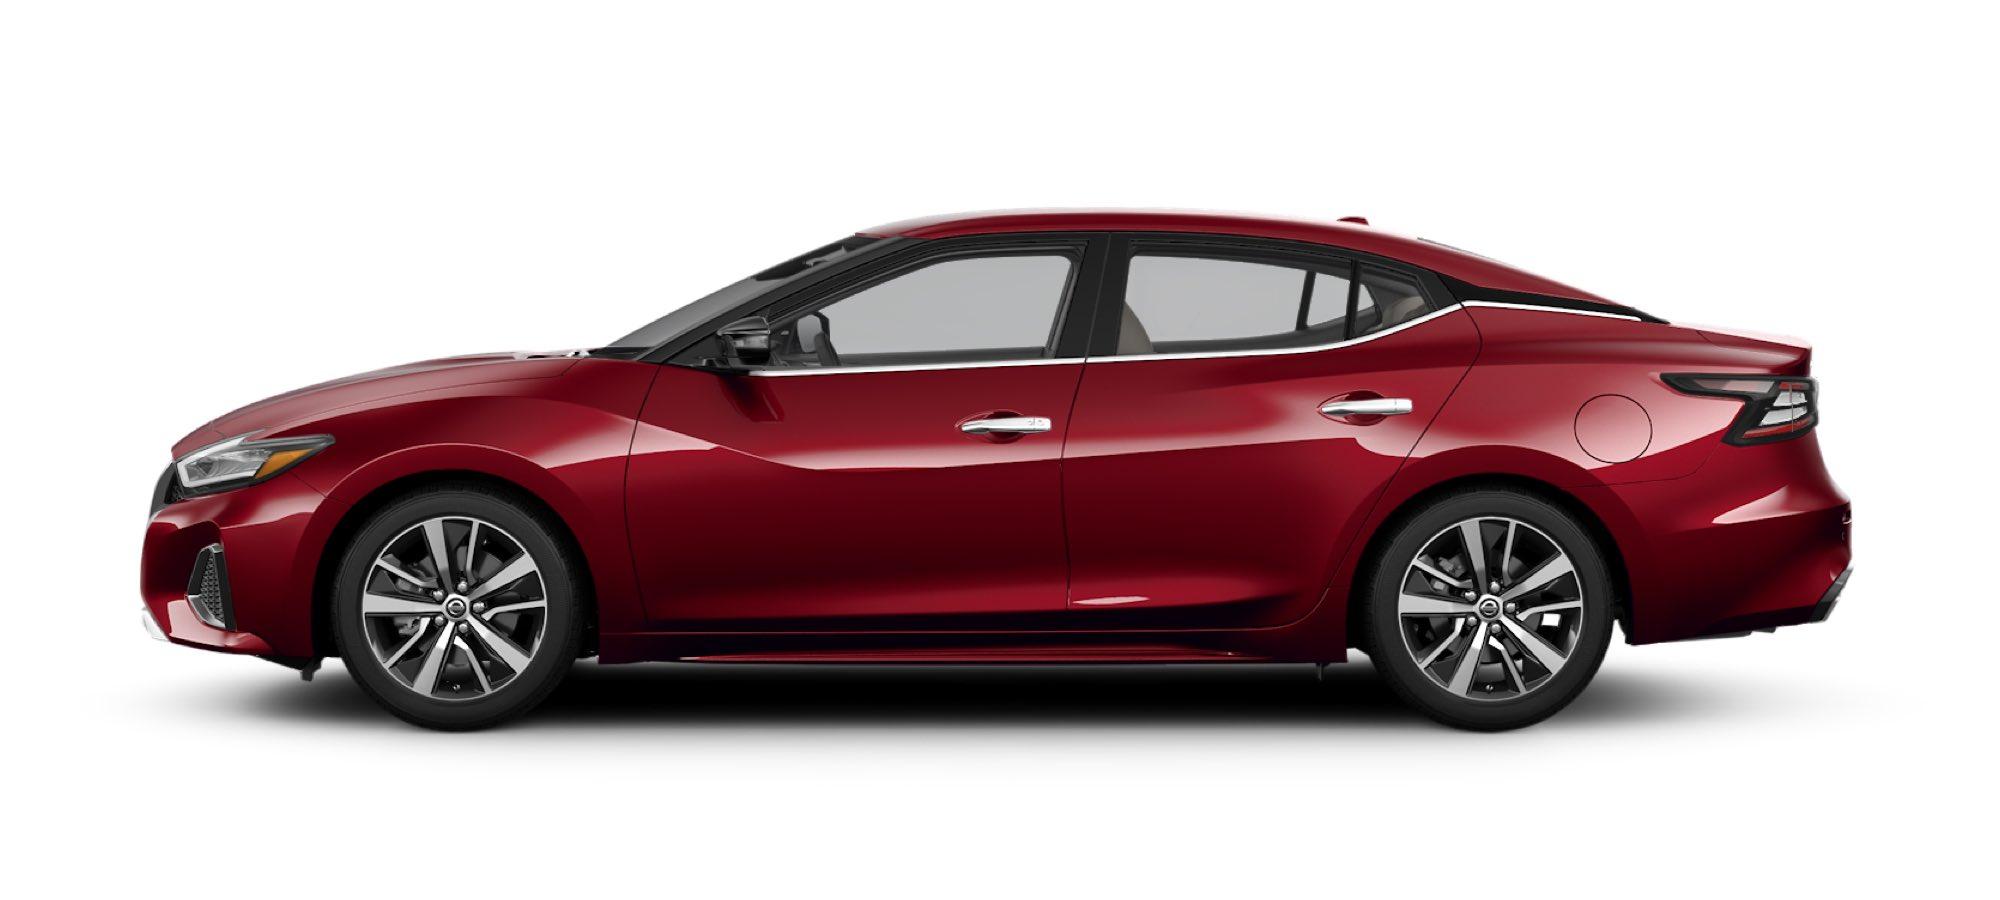 2021 Nissan Maxima in Carnelian Red Tintcoat